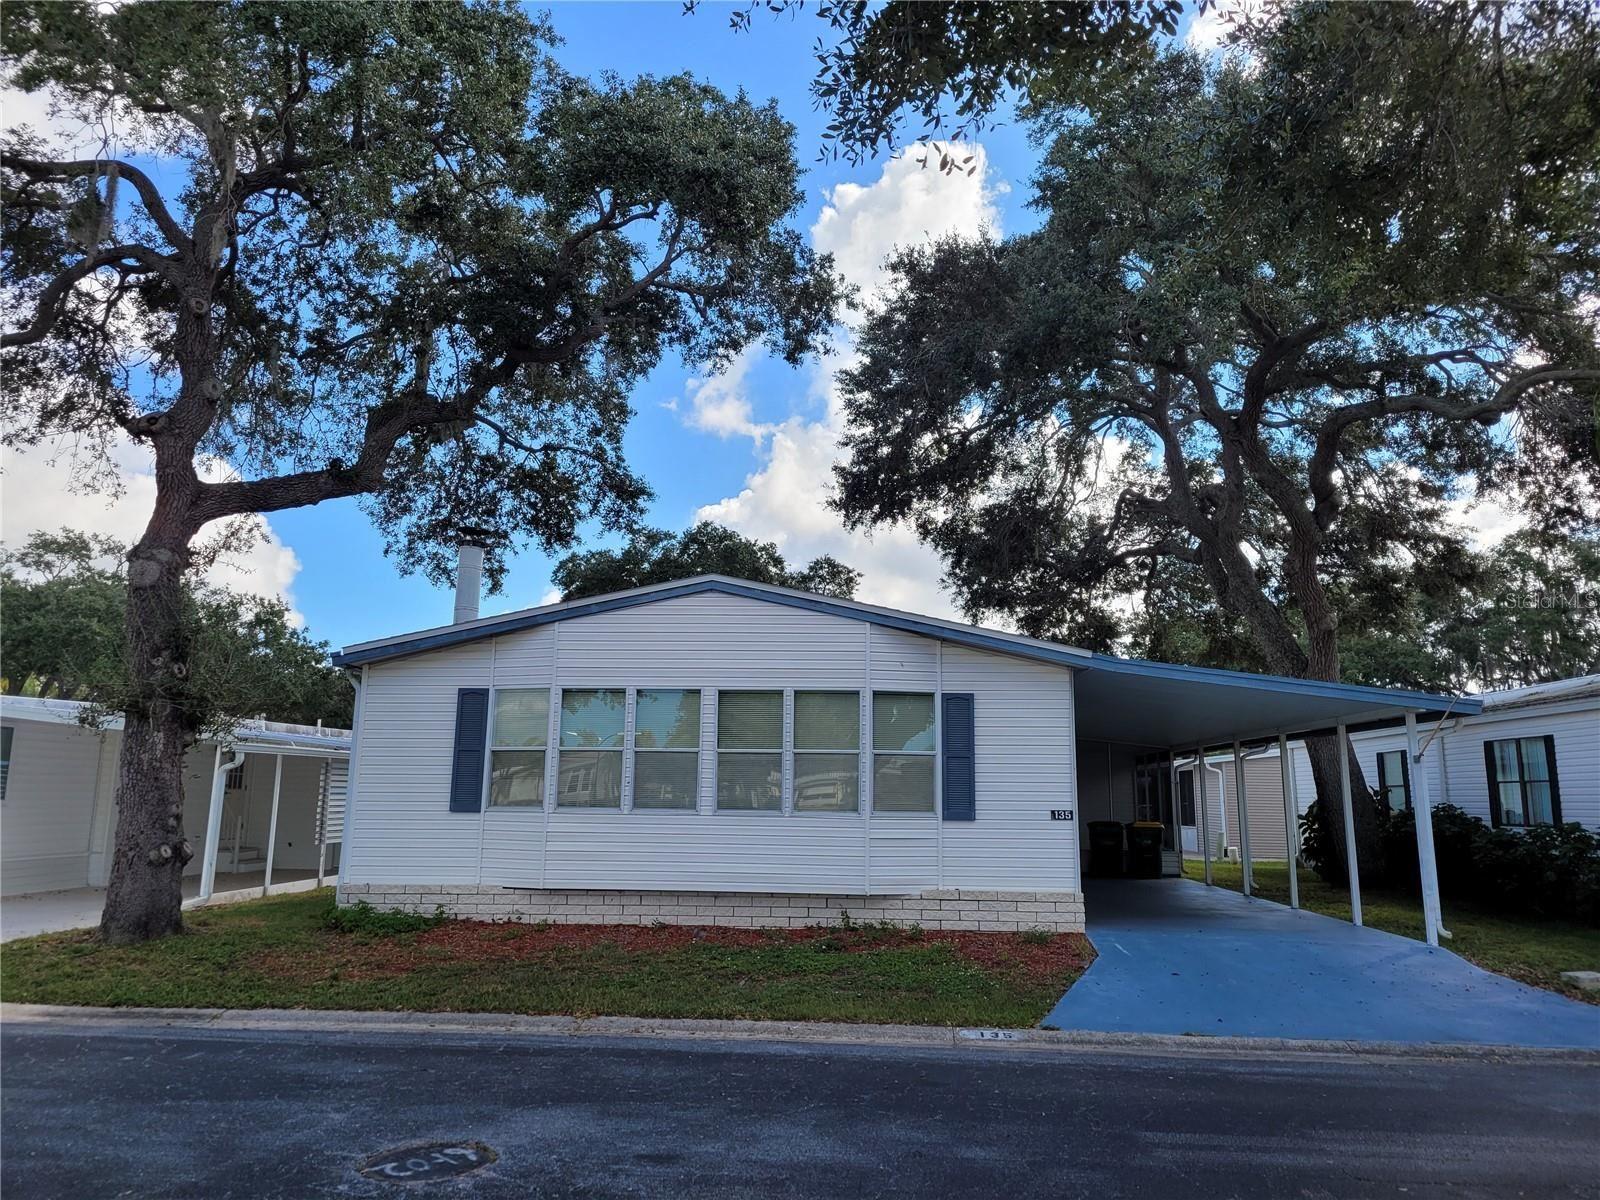 135 OAKWOOD LANE, Sarasota, FL 34237 - #: A4515052